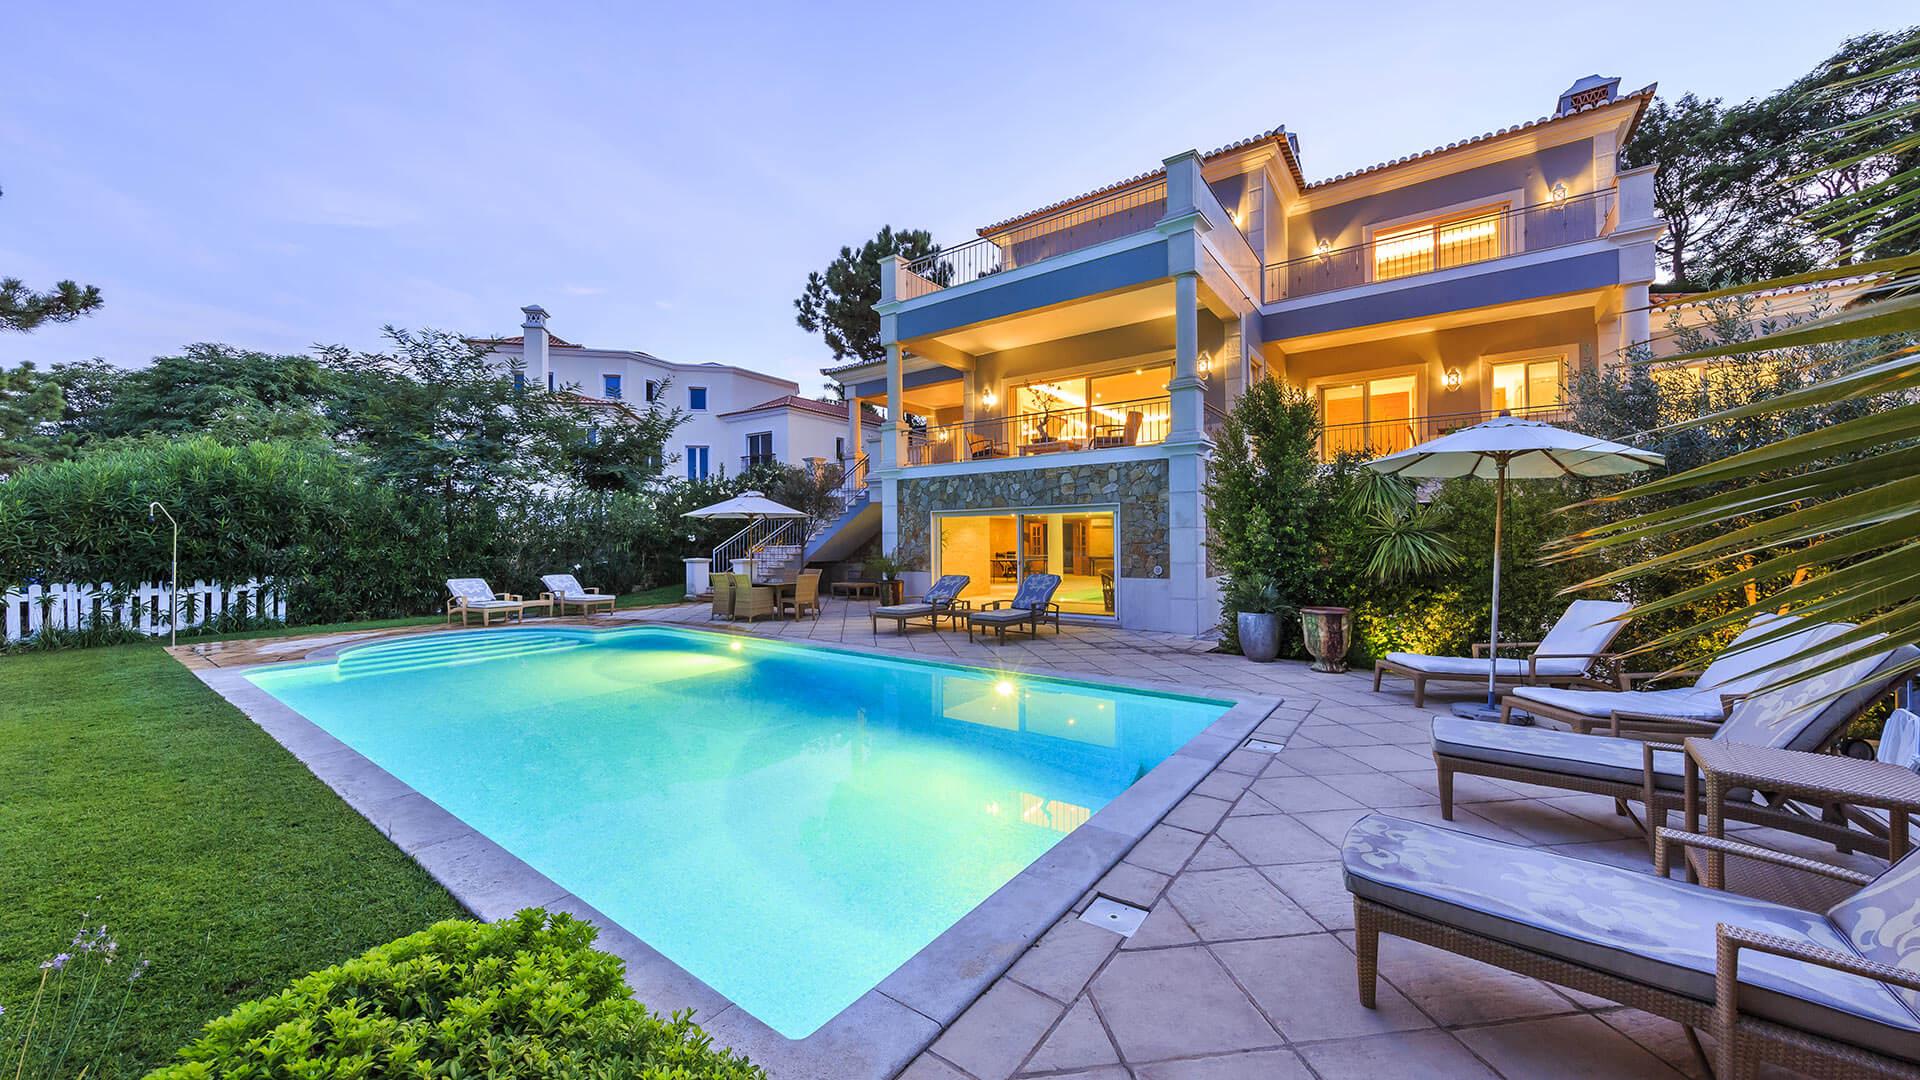 Night View Of The House Villa Cyclamen In Algarve